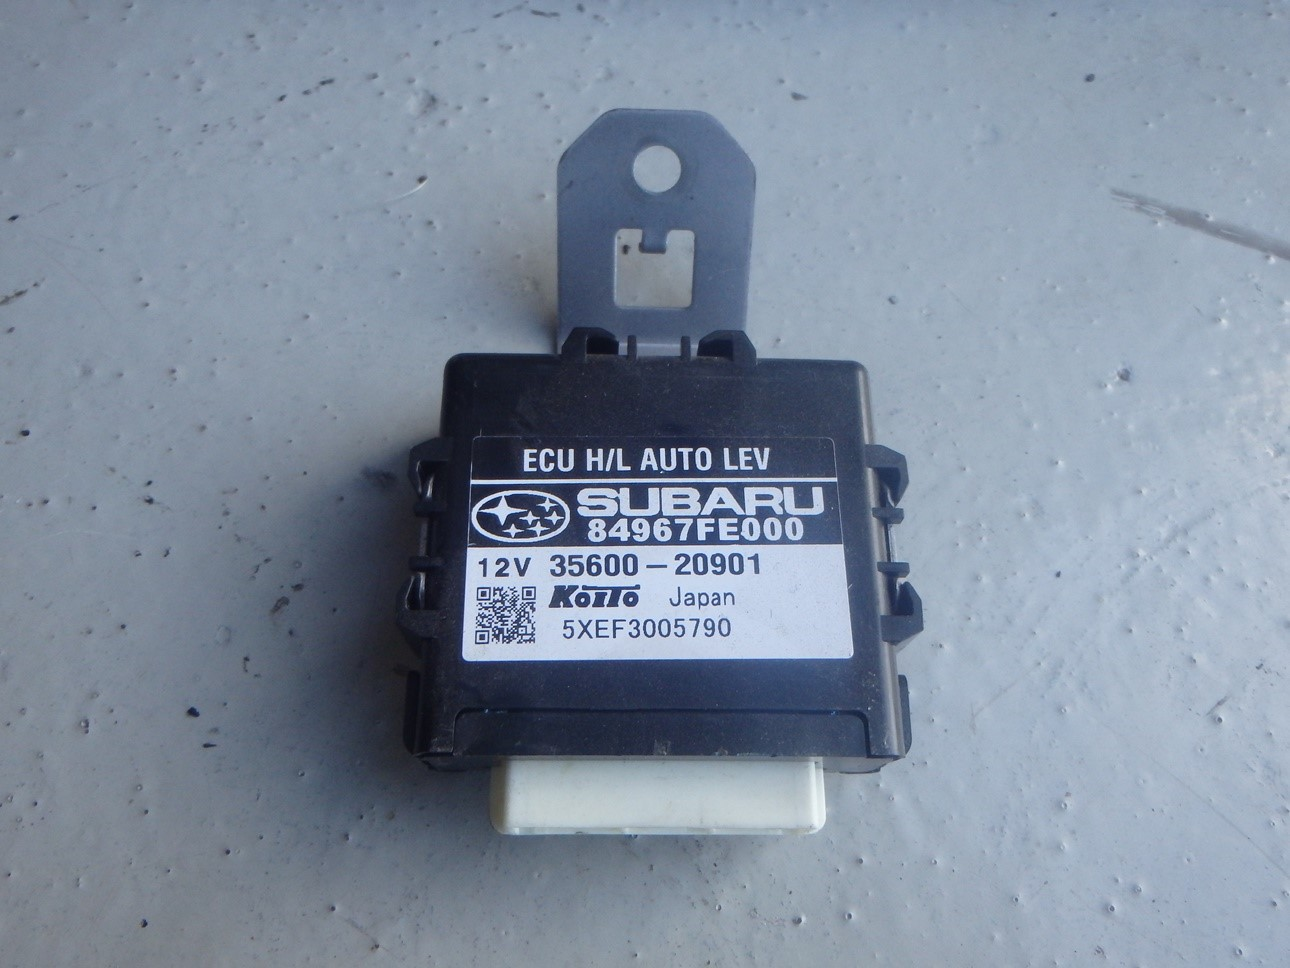 Details about Subaru Impreza WRX GDA Headlight ECU H/L Auto Level 84967FE000